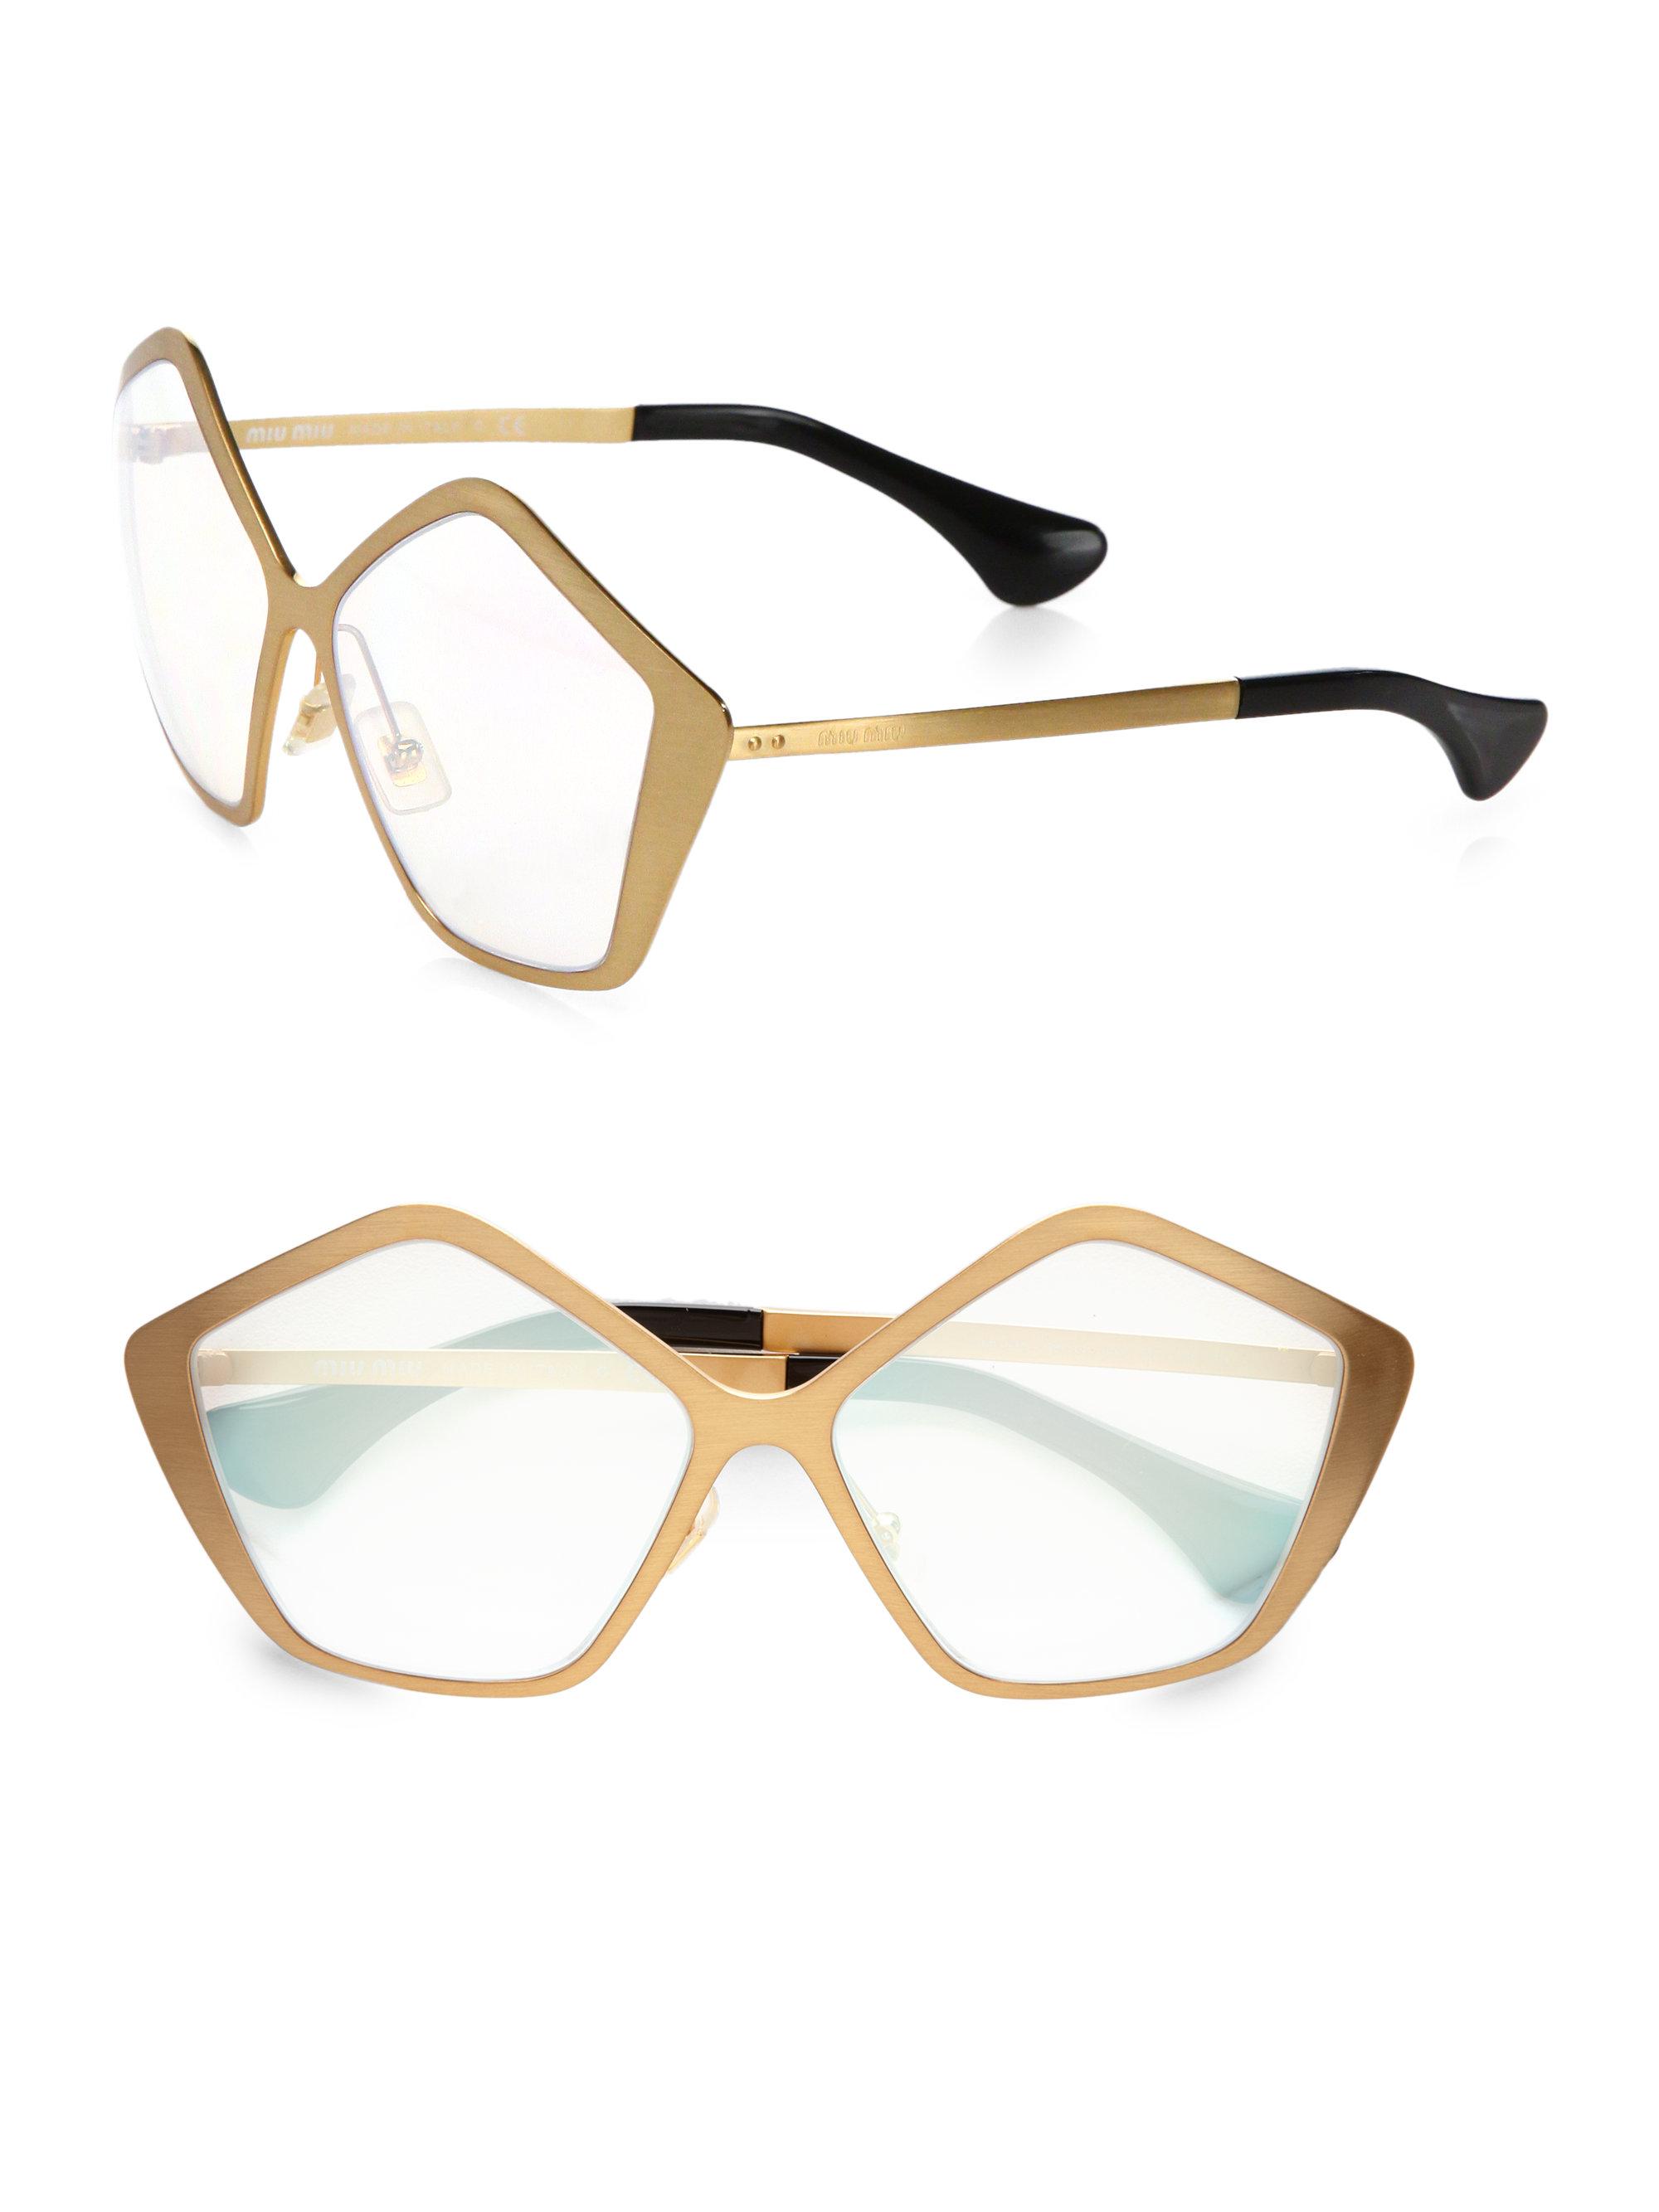 84b82d7337b Lyst - Miu Miu Brushed Gold Metal Culte Star Sunglasses in Metallic